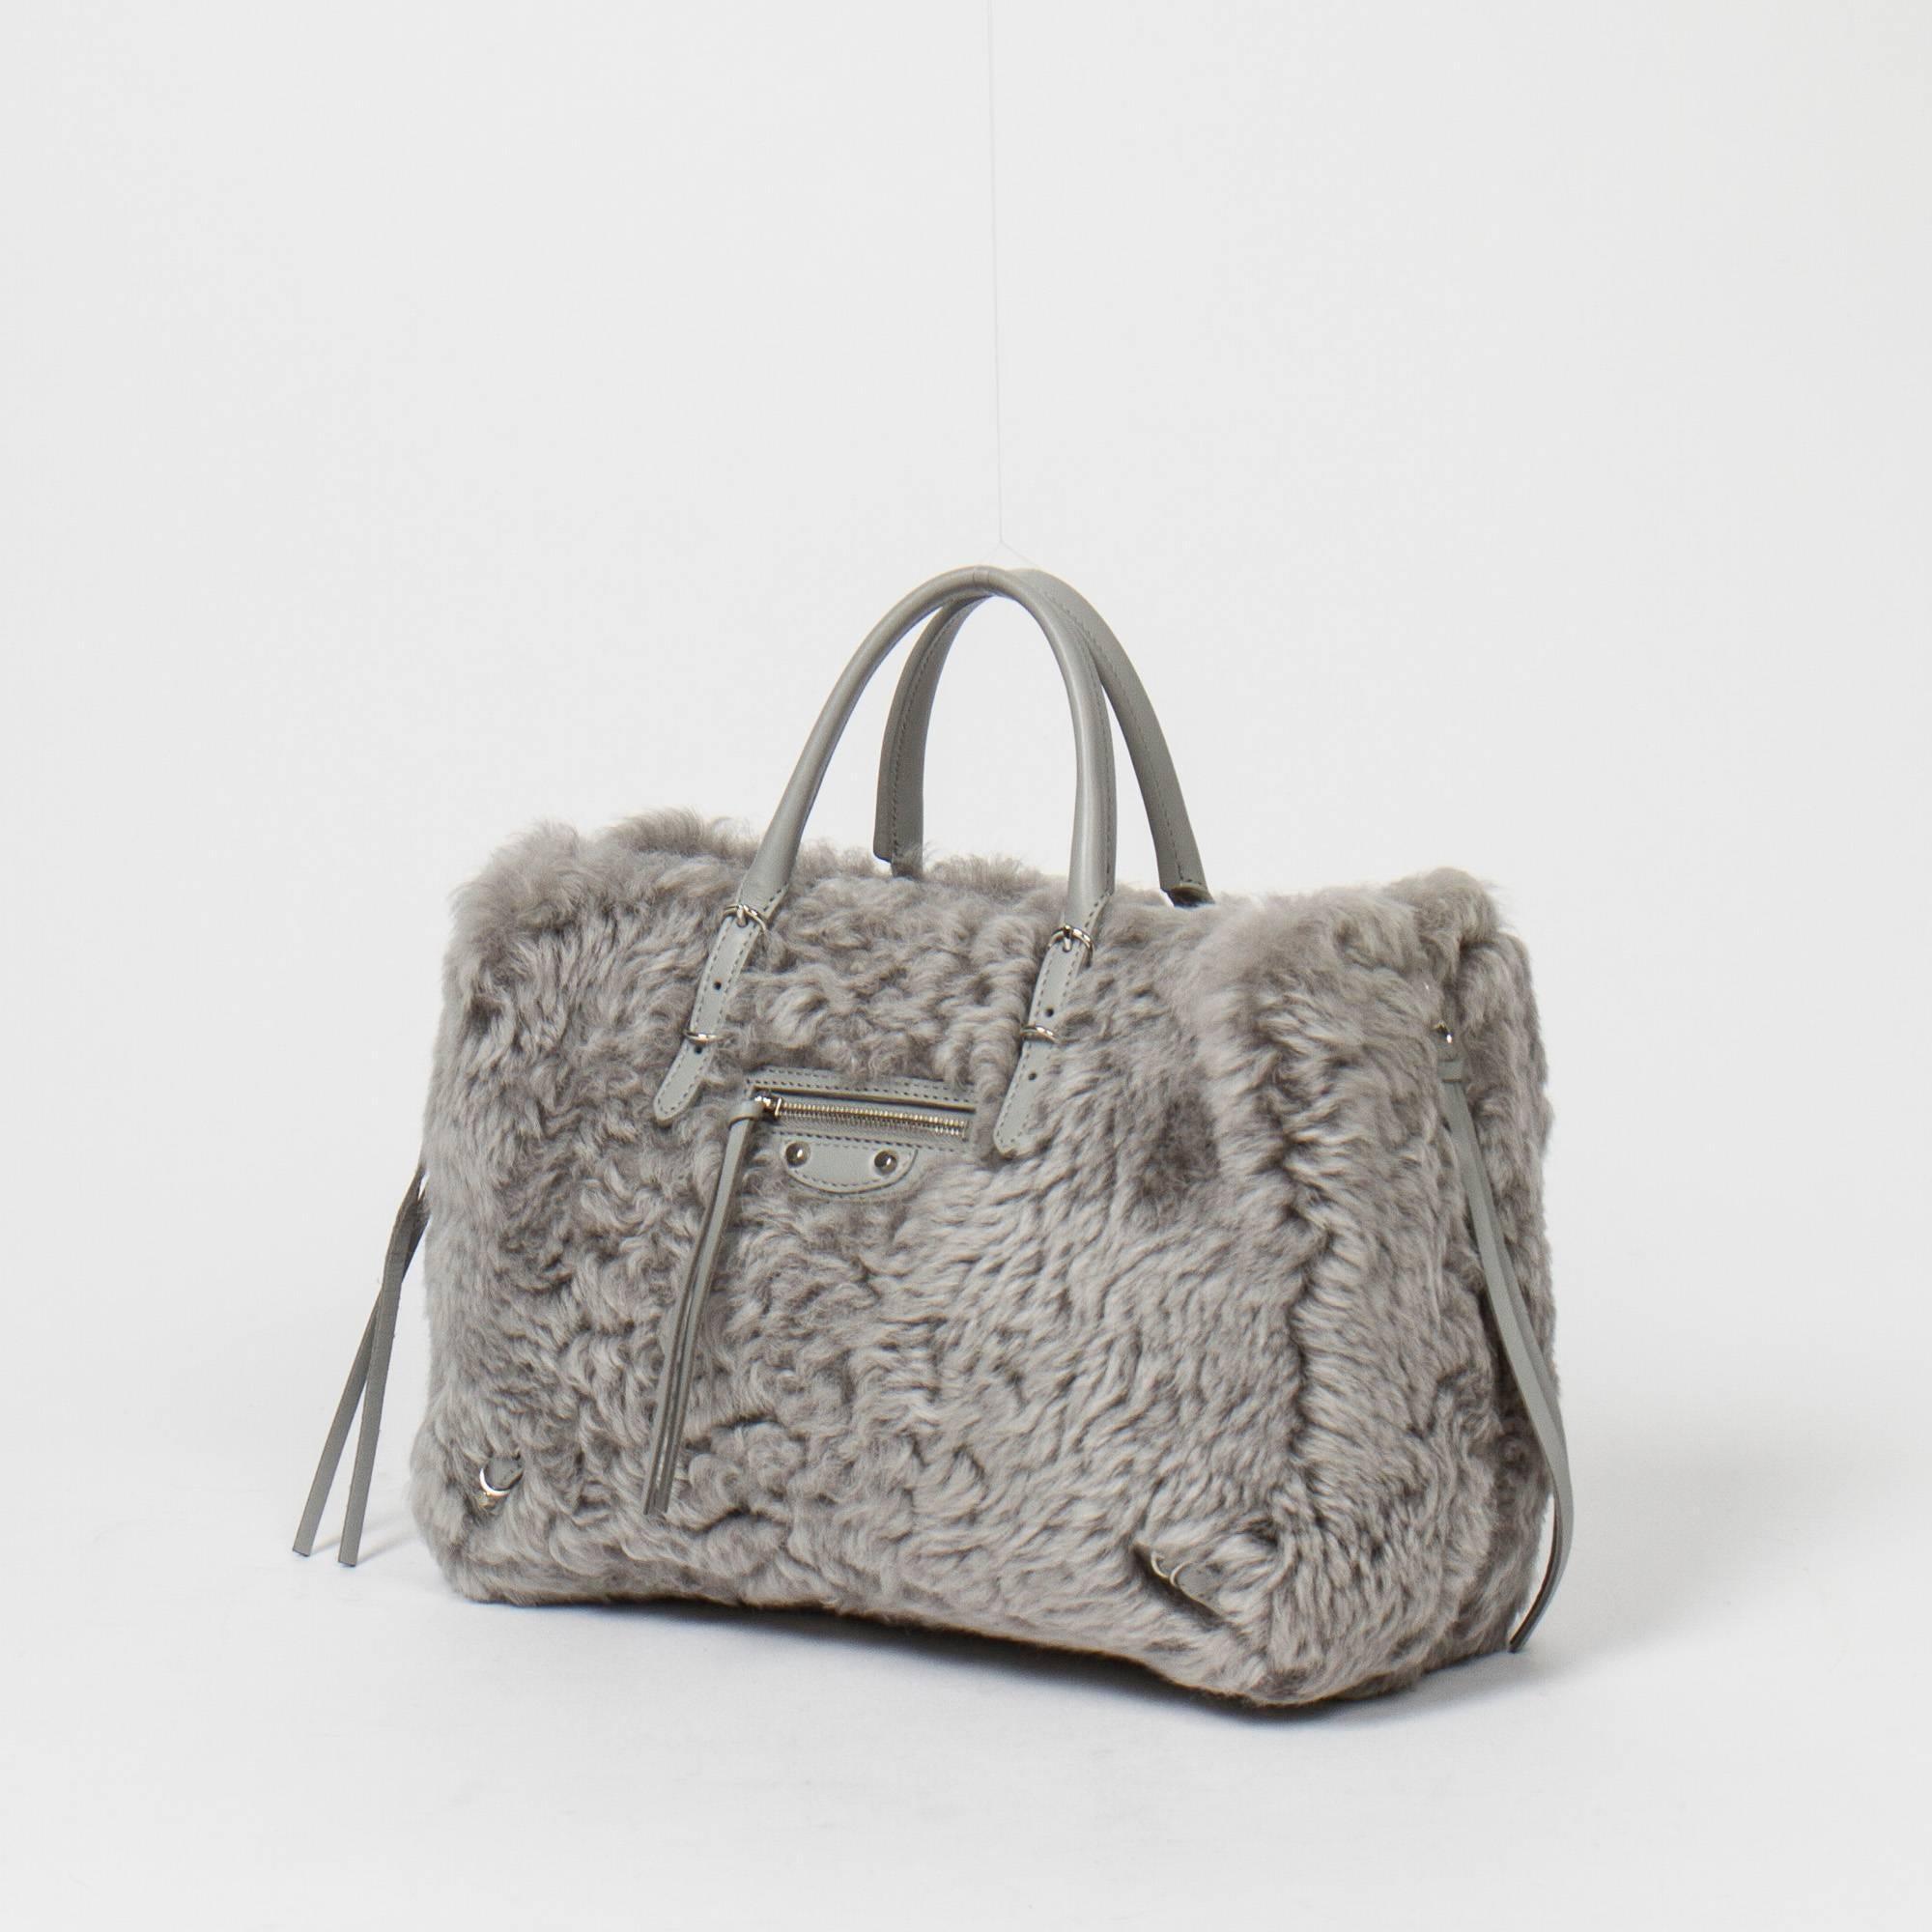 Balenciaga Papier A6 Mini Zip Around In Grey Merino Lamb Fur 1z0v84